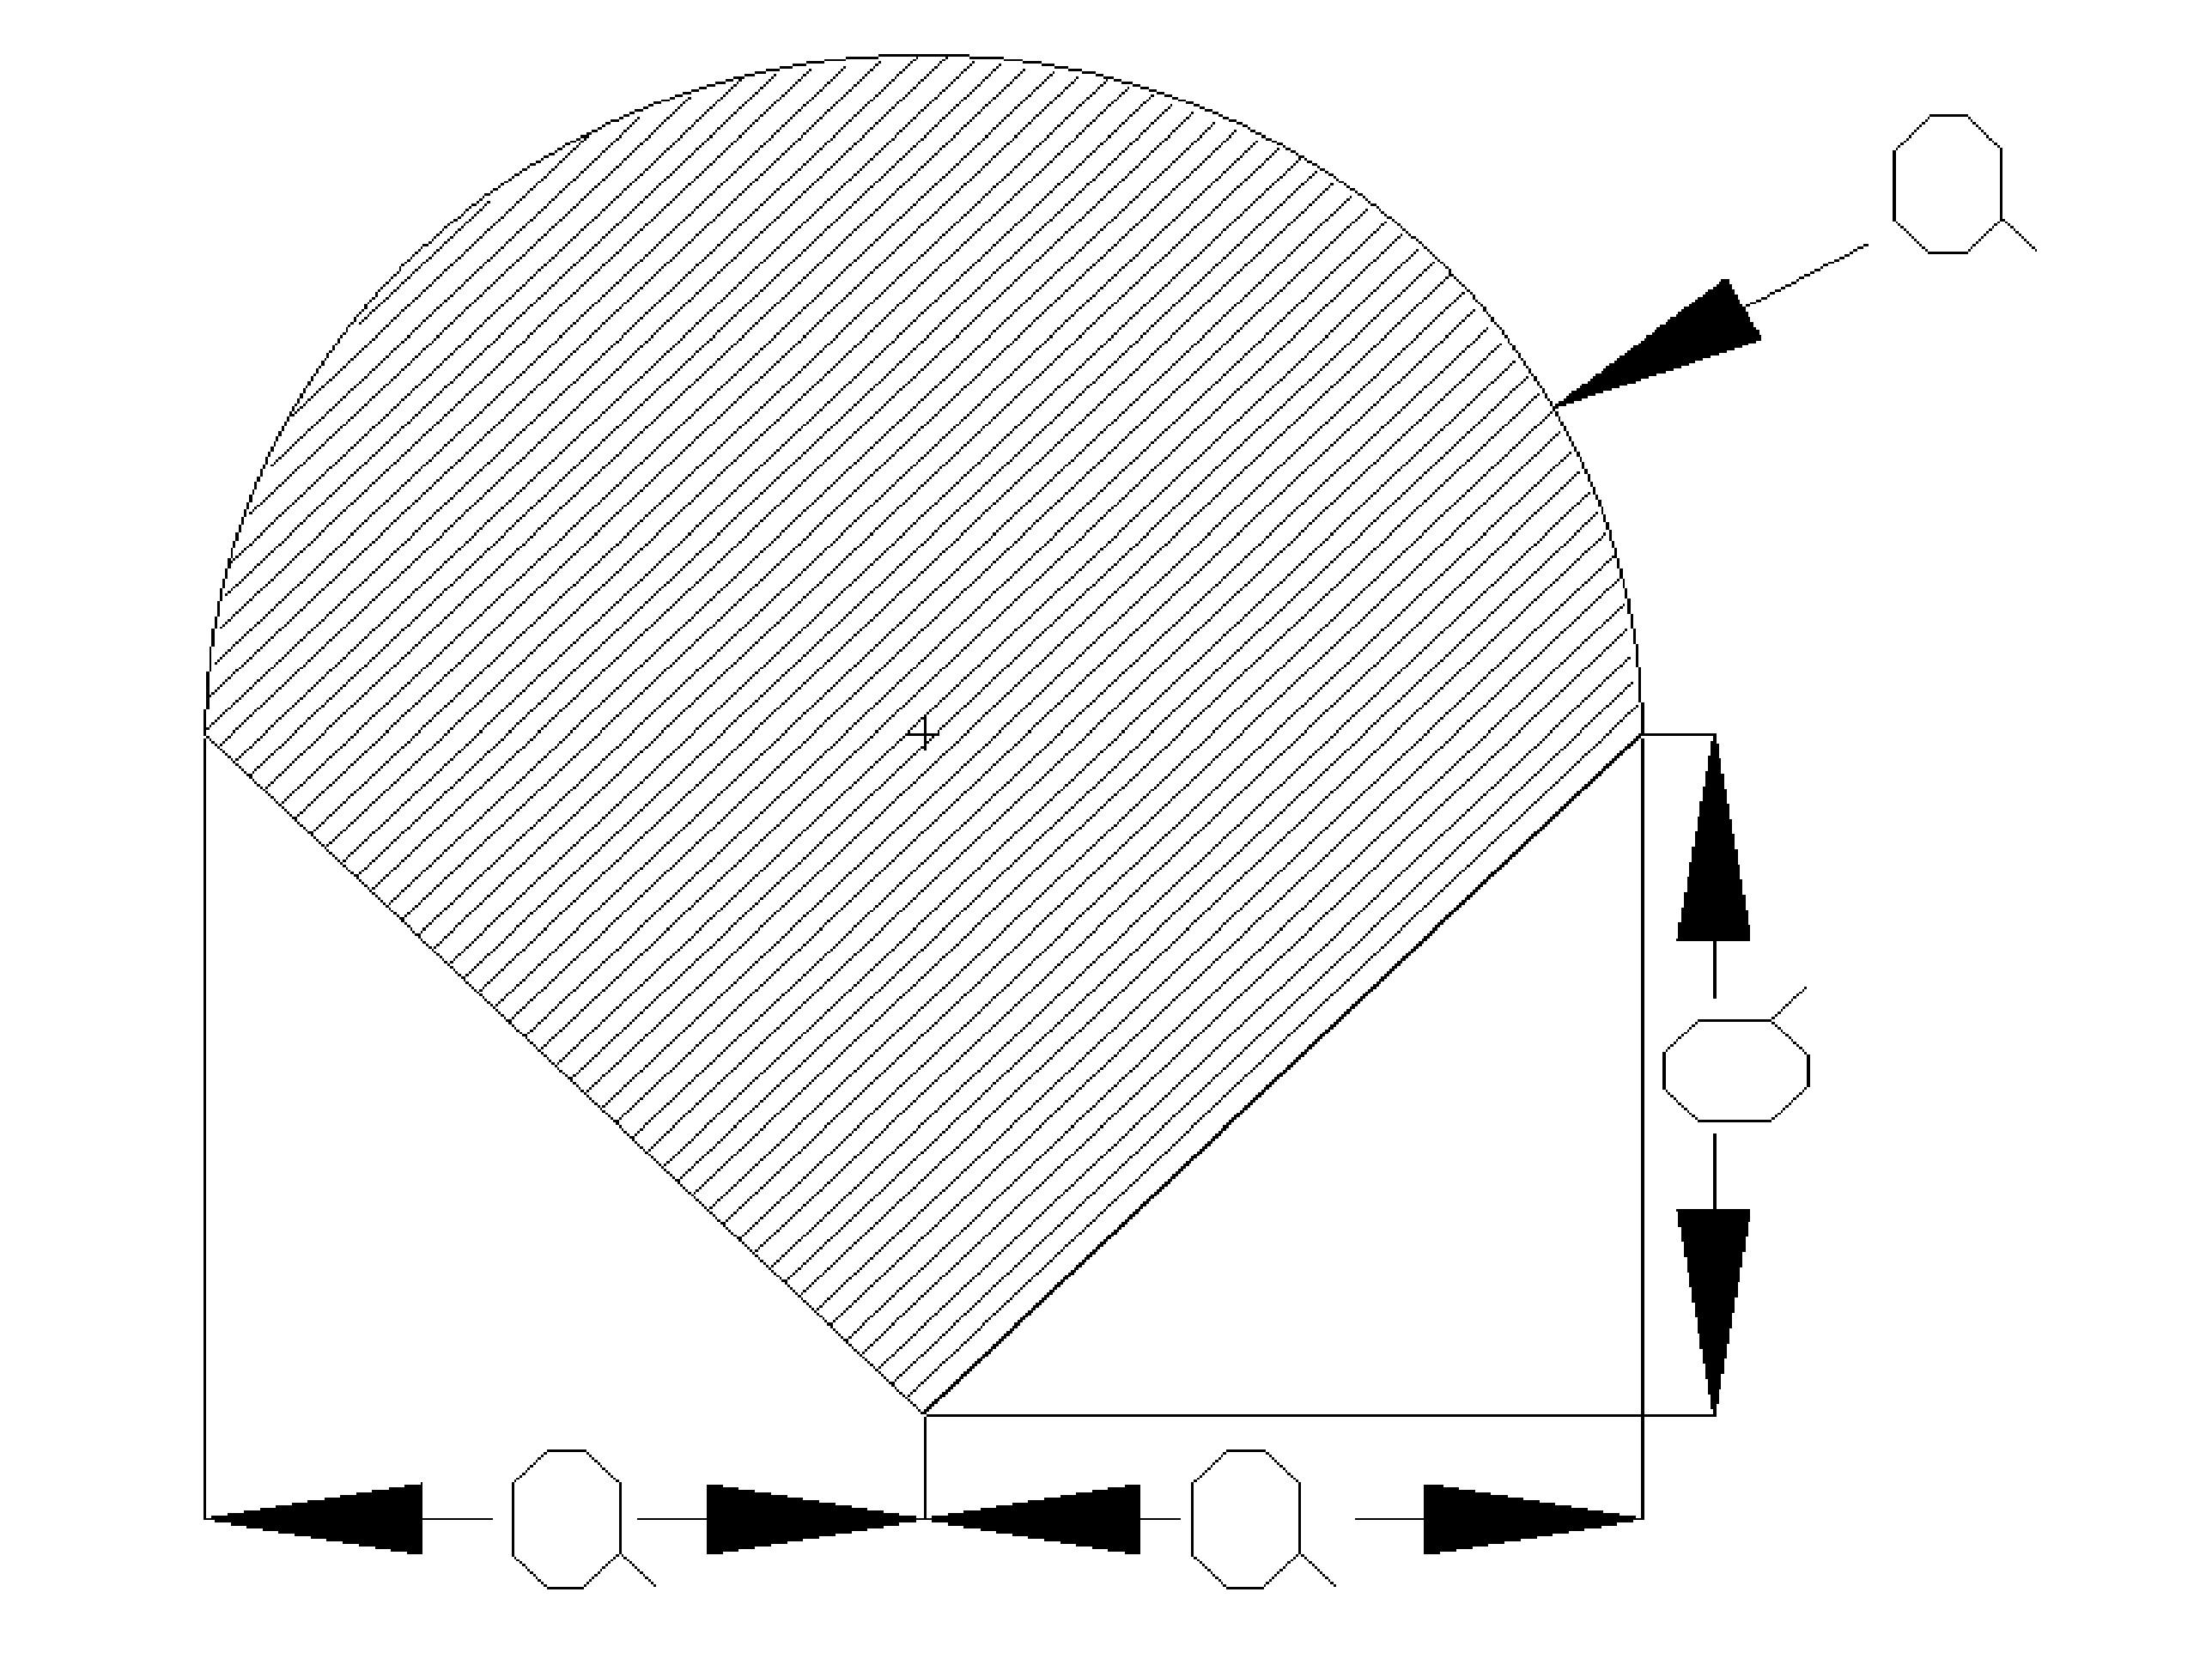 srodekciezkosci1